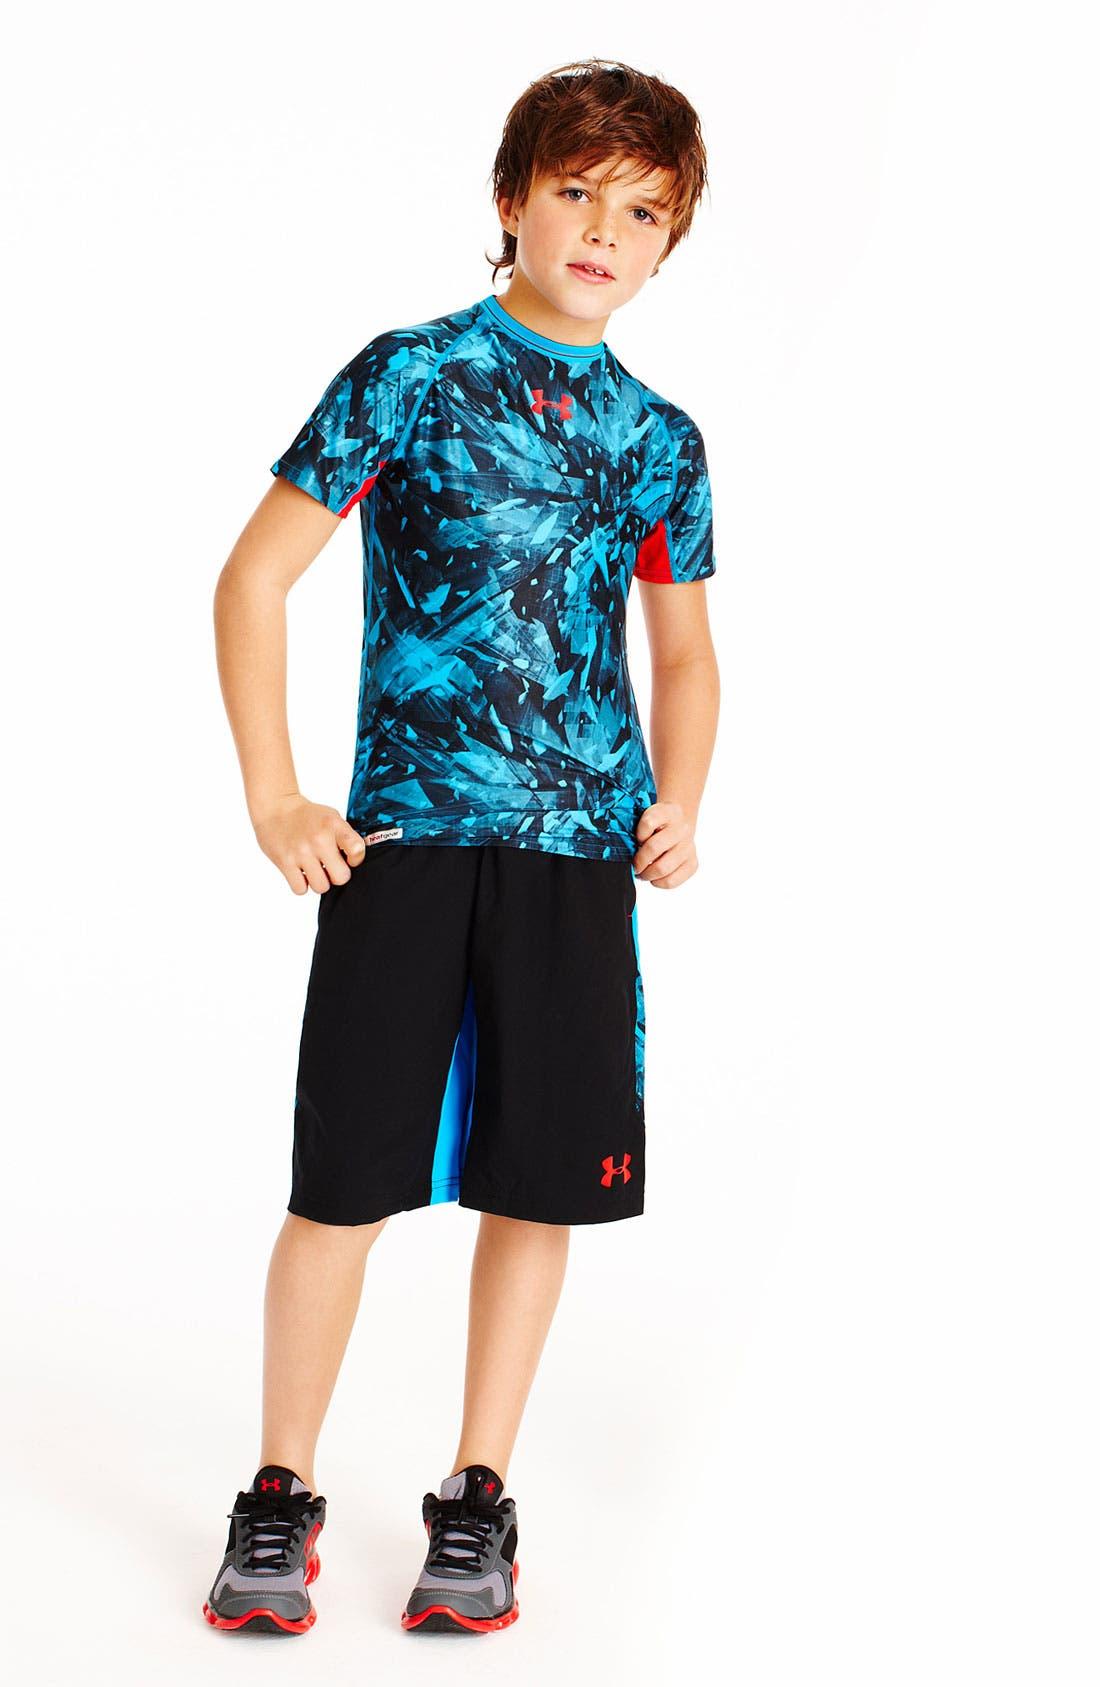 Main Image - Under Armour T-Shirt & Shorts